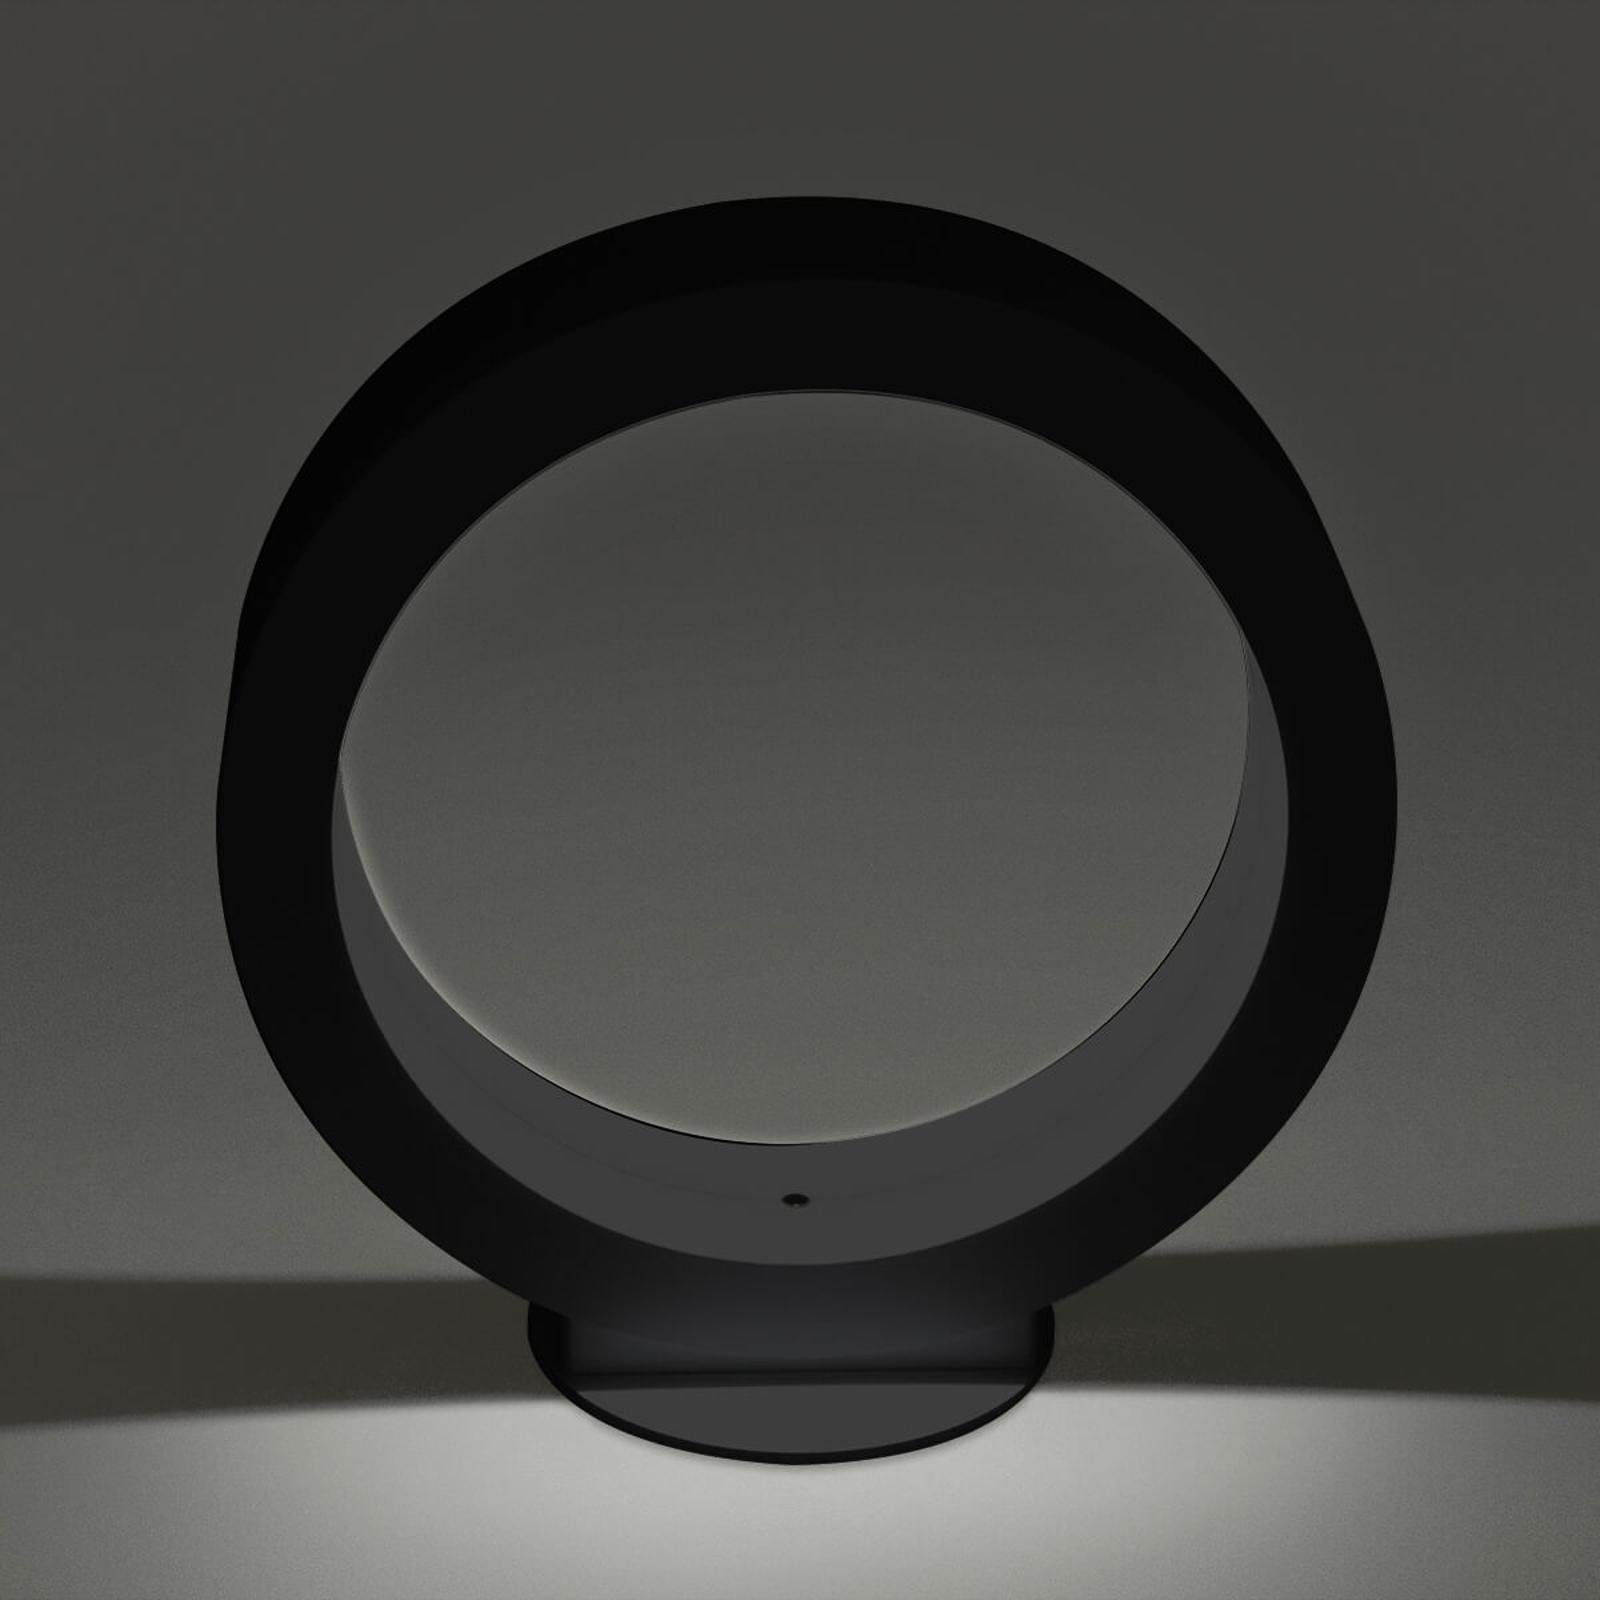 Cini&Nils Assolo - LED-Tischleuchte schwarz, 20 cm